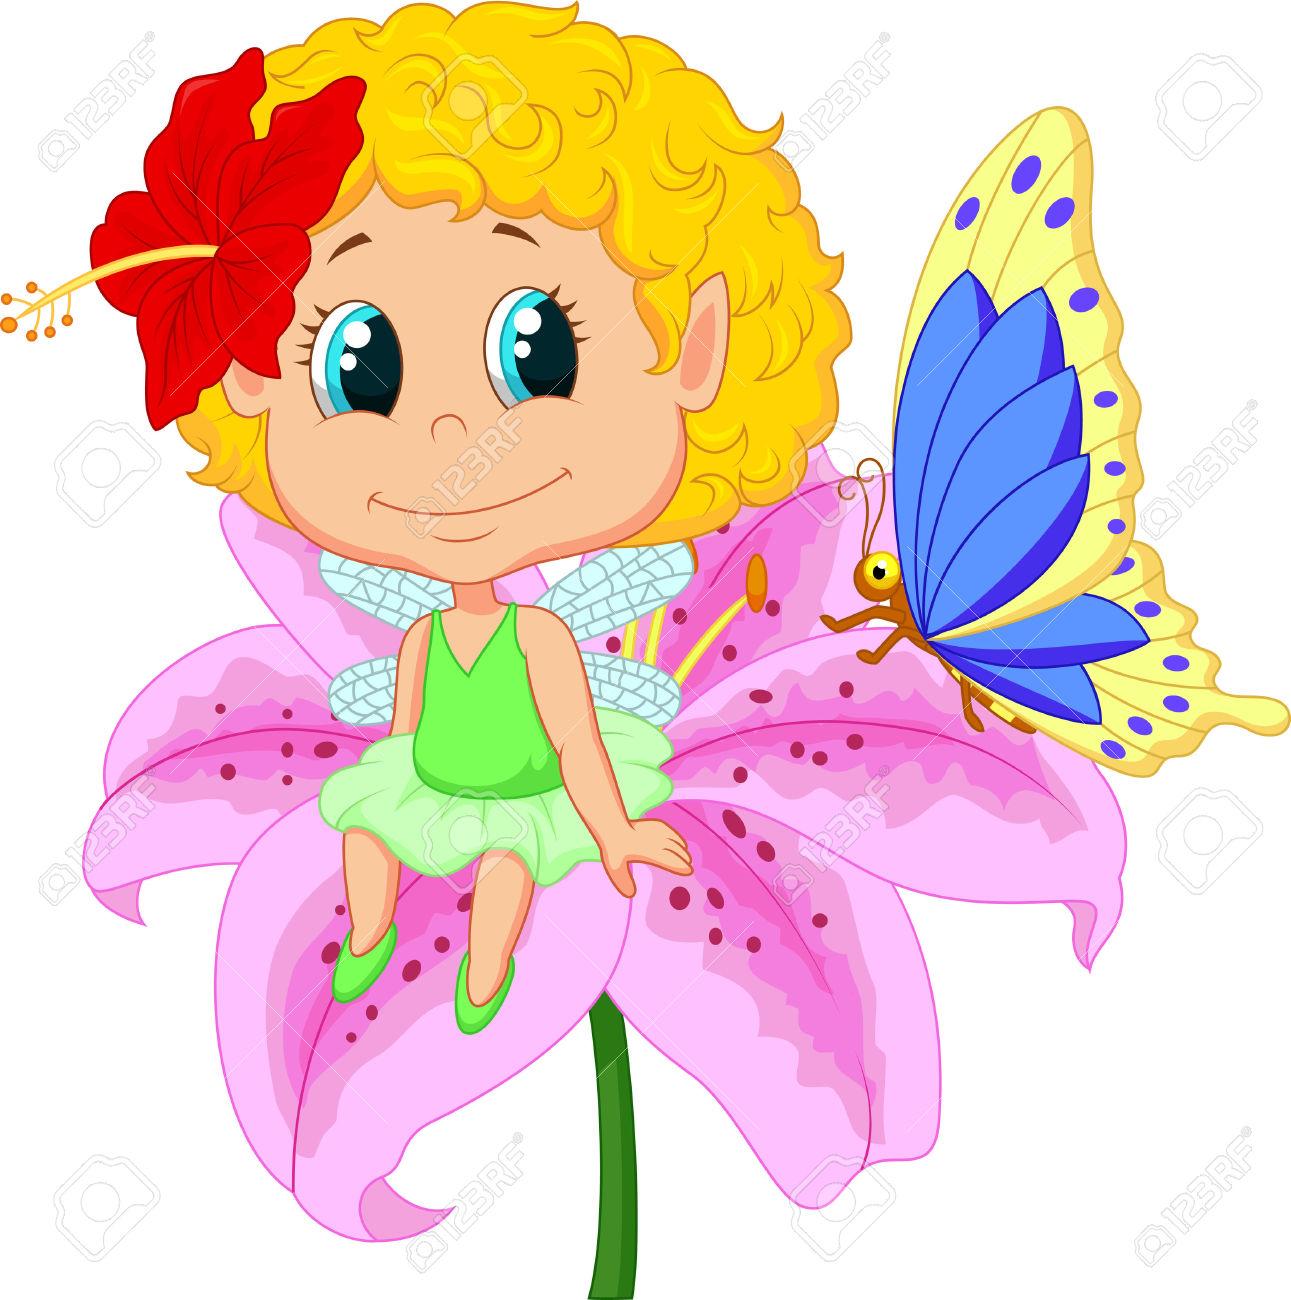 Baby Fairy Elf Cartoon Sitting On Flower Royalty Free Cliparts.